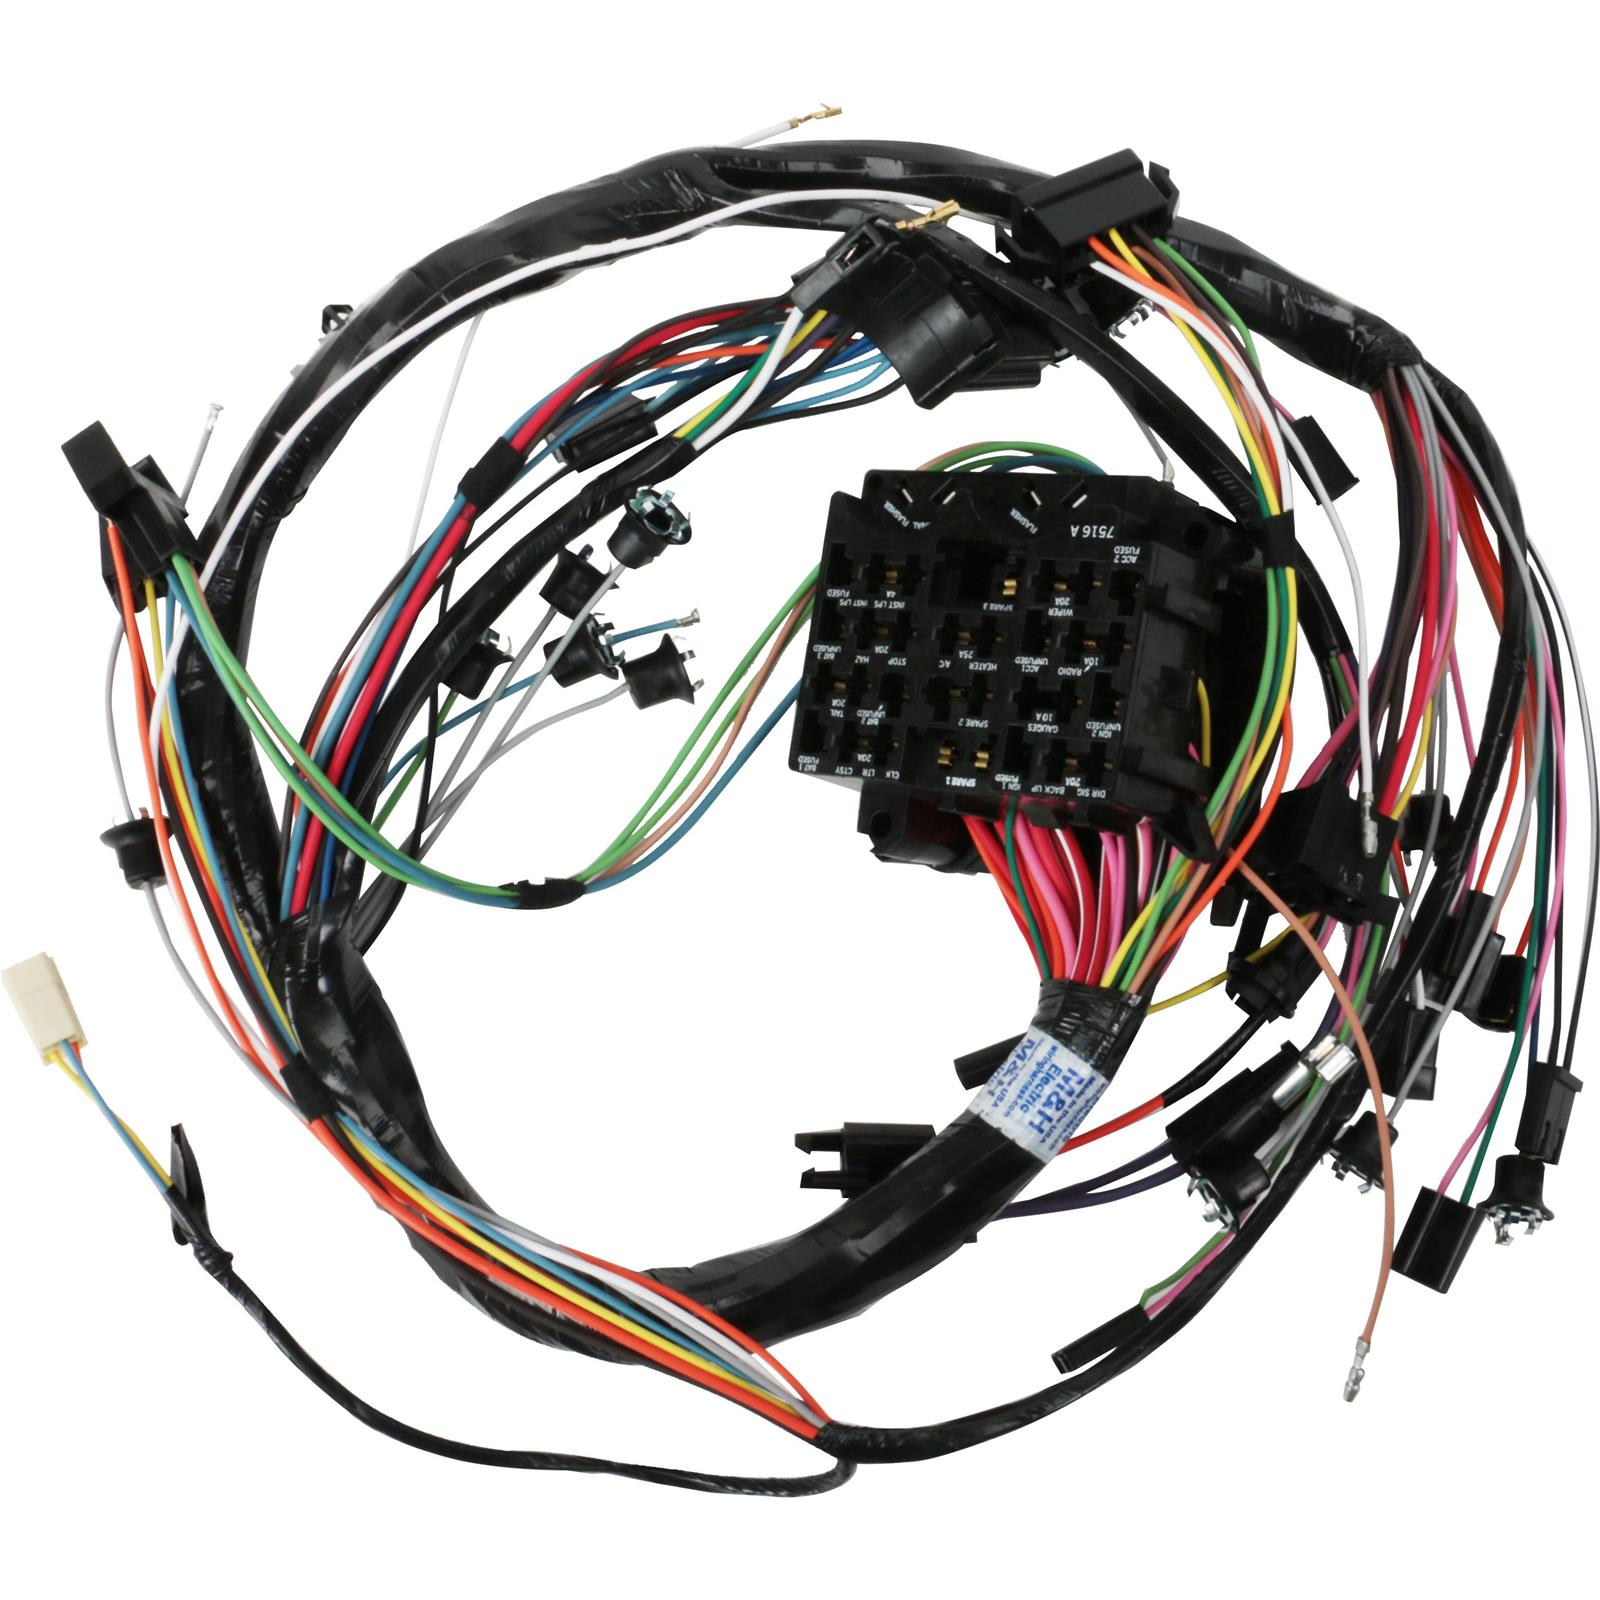 M h electric 39045 dash wiring harness 1968 gm a body w gauges